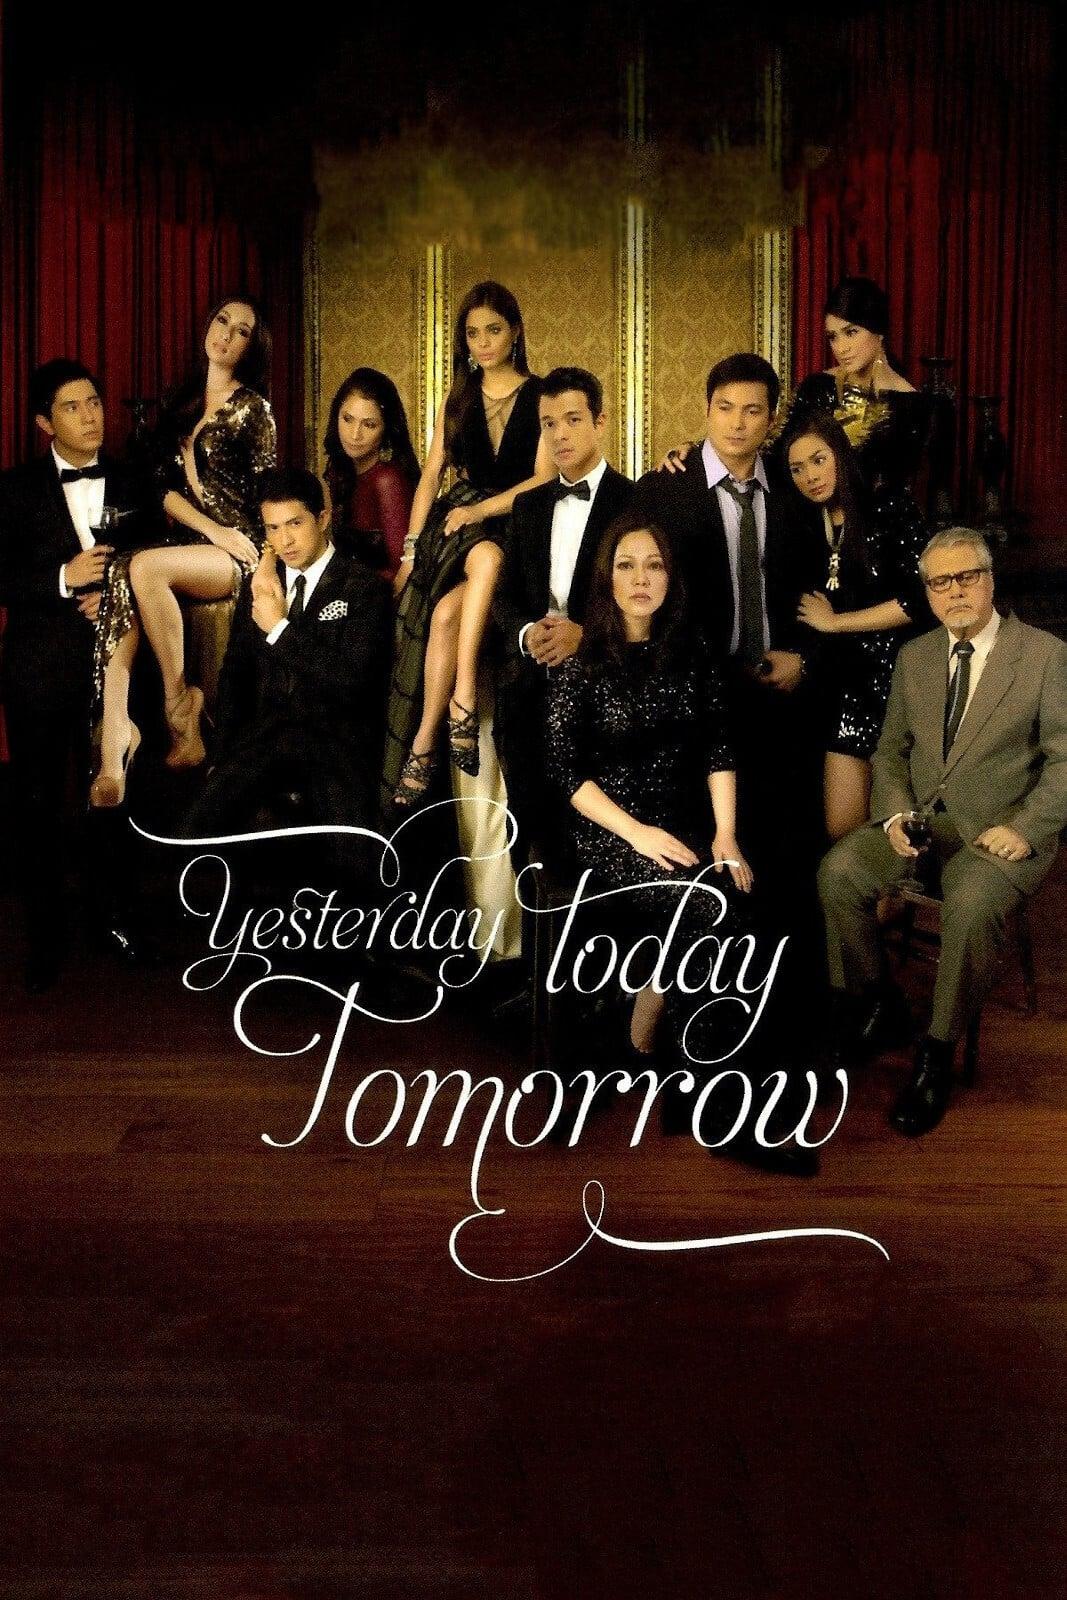 Yesterday Today Tomorrow (2011)